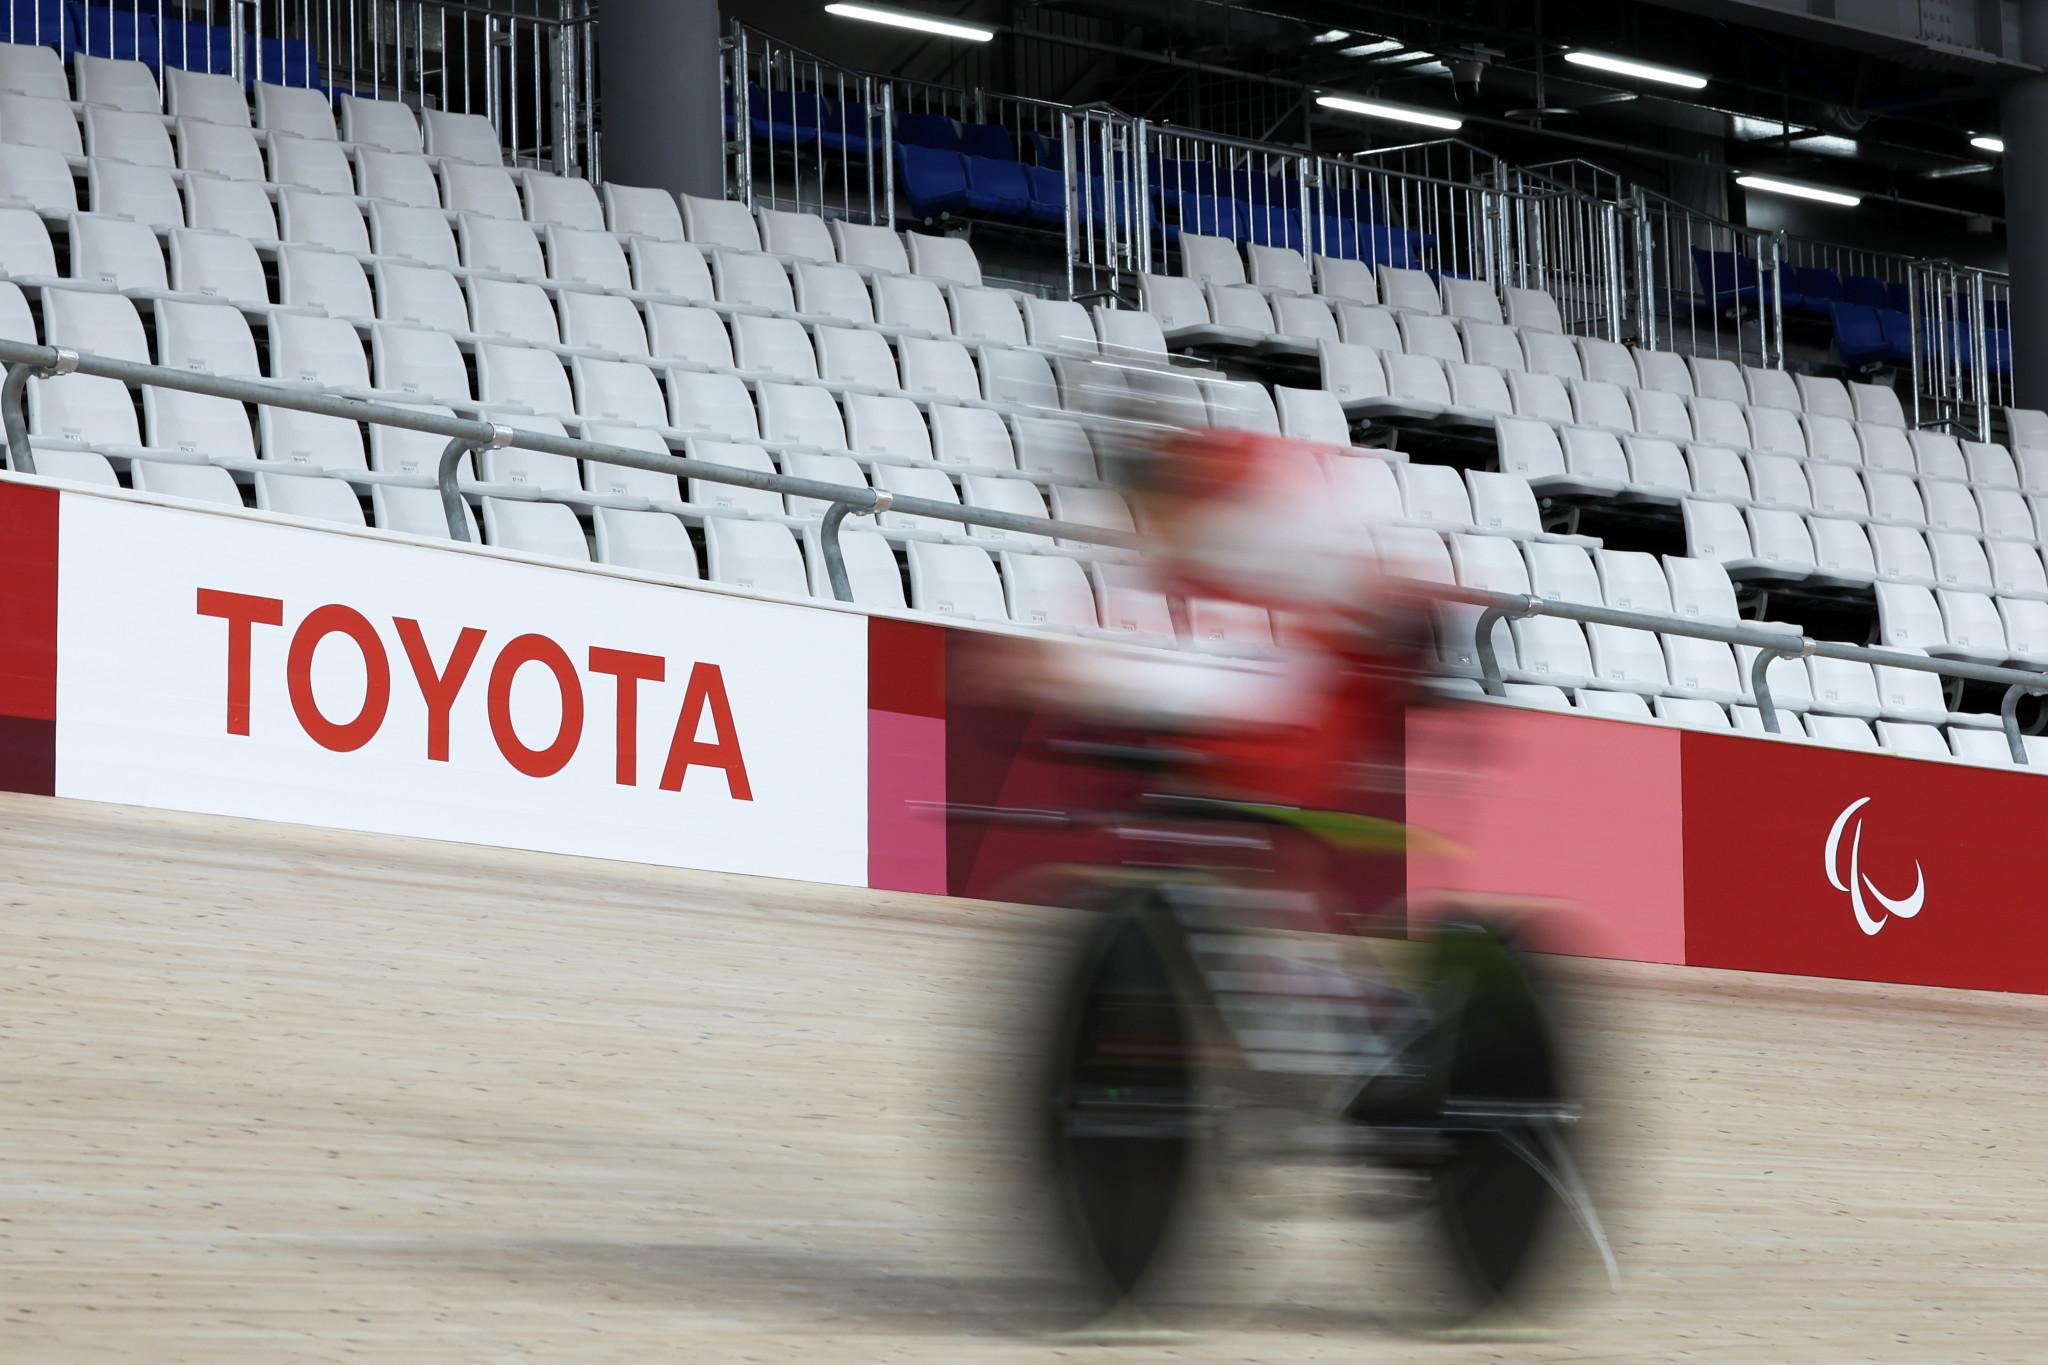 Li secures gold as Para cycling world records continue to fall at Tokyo 2020